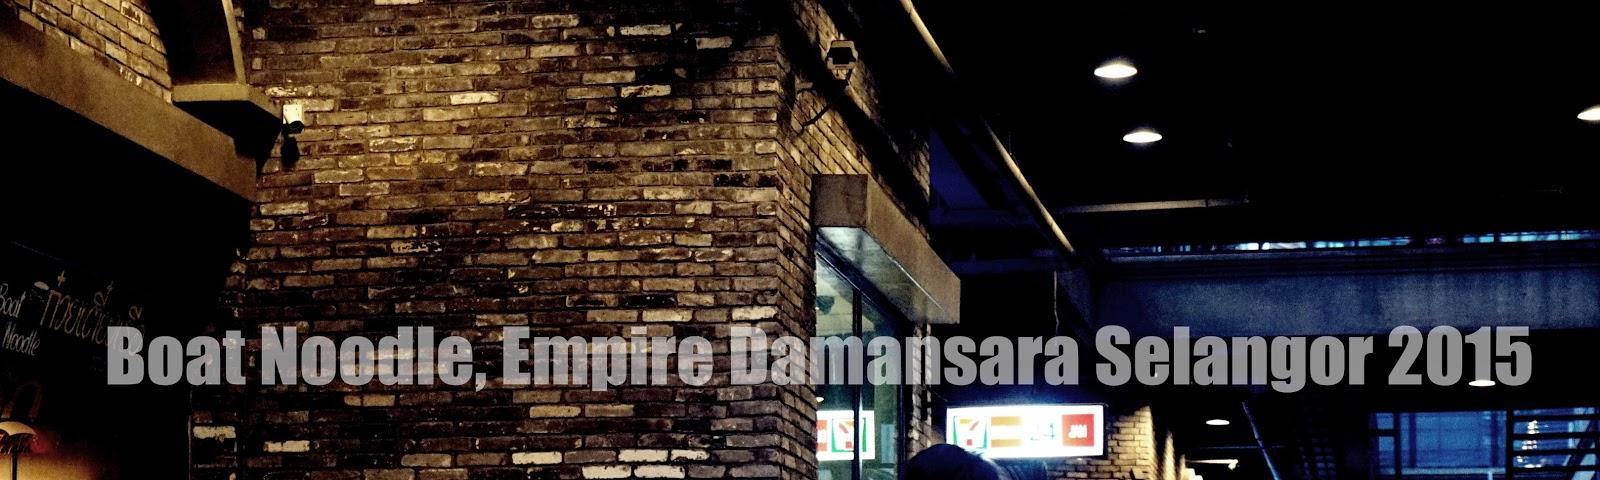 http://enna-banana.blogspot.com/2015/04/boat-noodle-empire-damansara-selangor.html